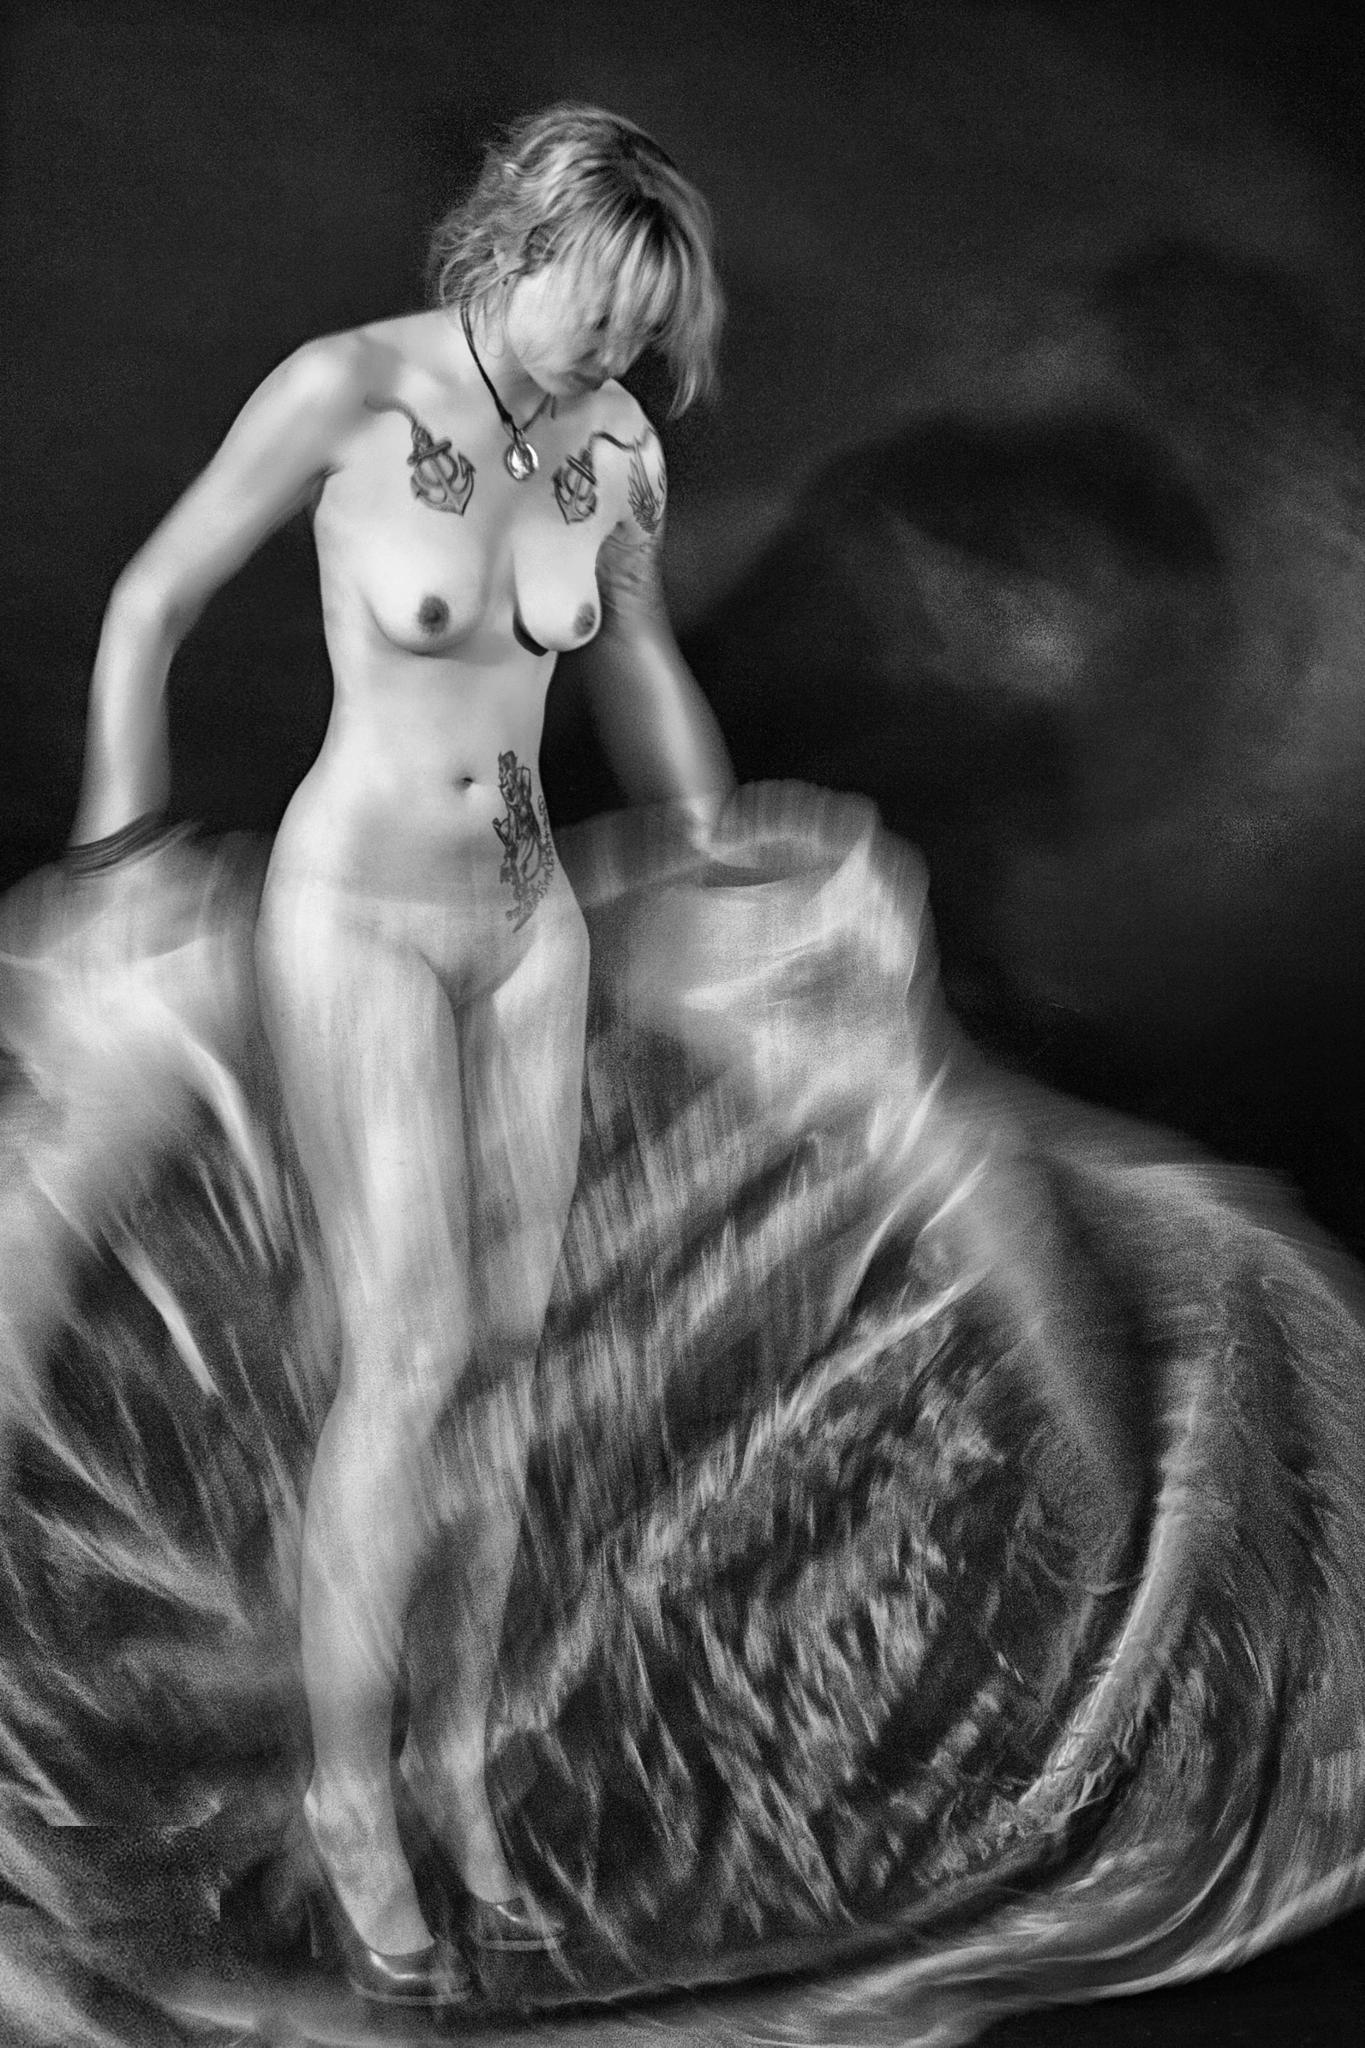 White Satin by ulrich.grolla